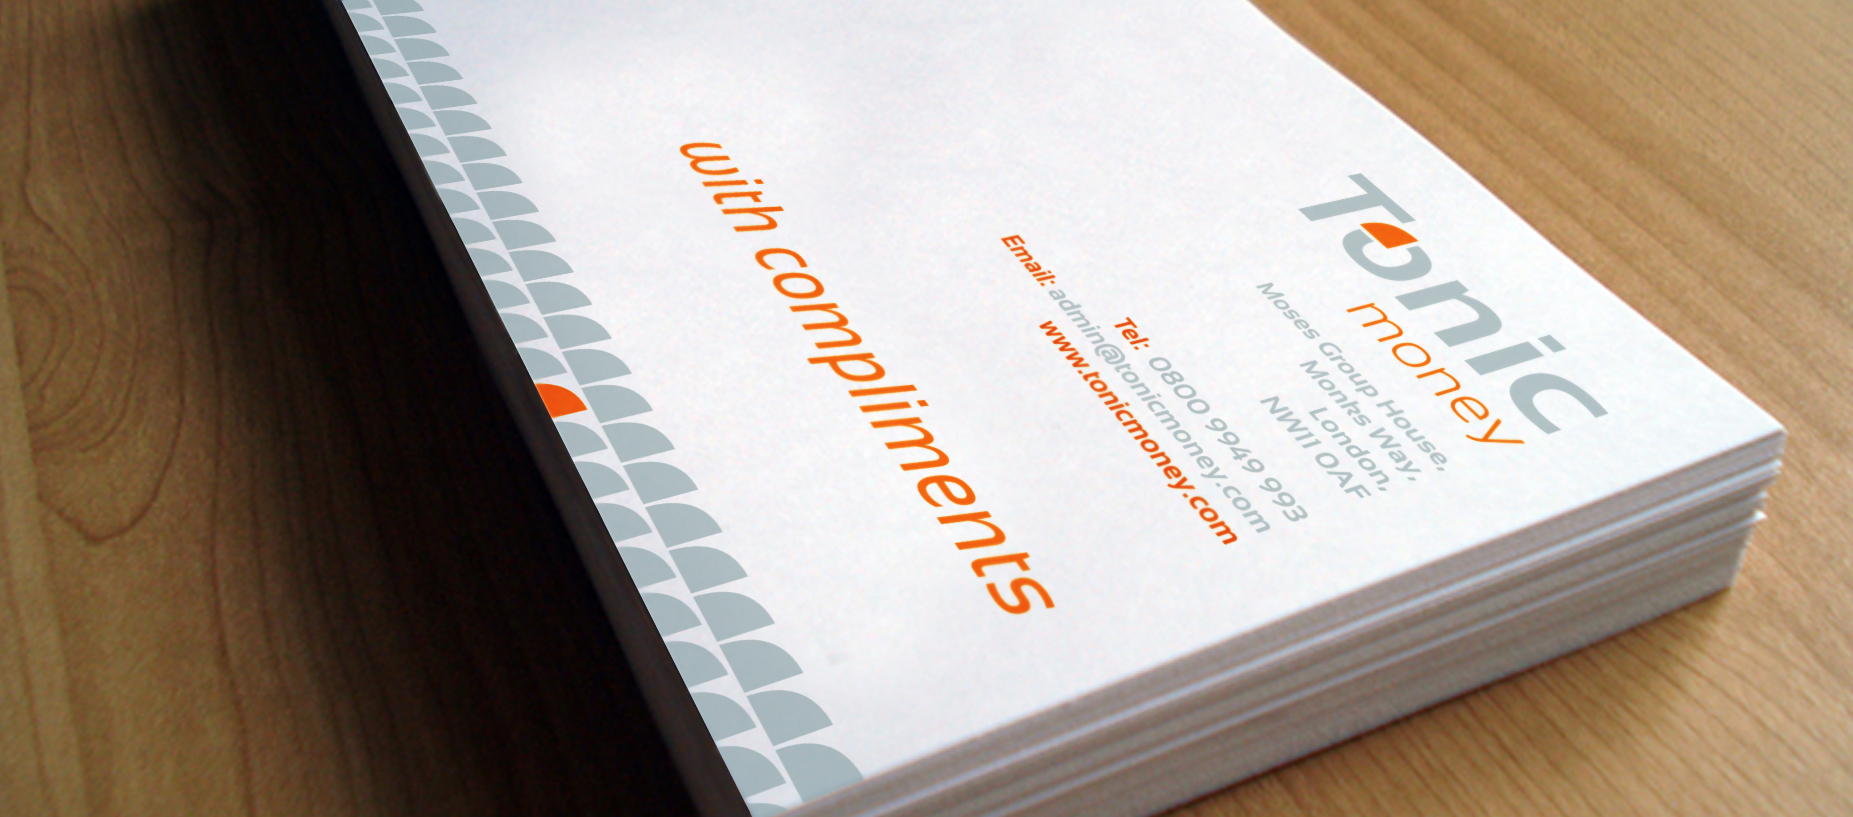 branding Tonic comp slips